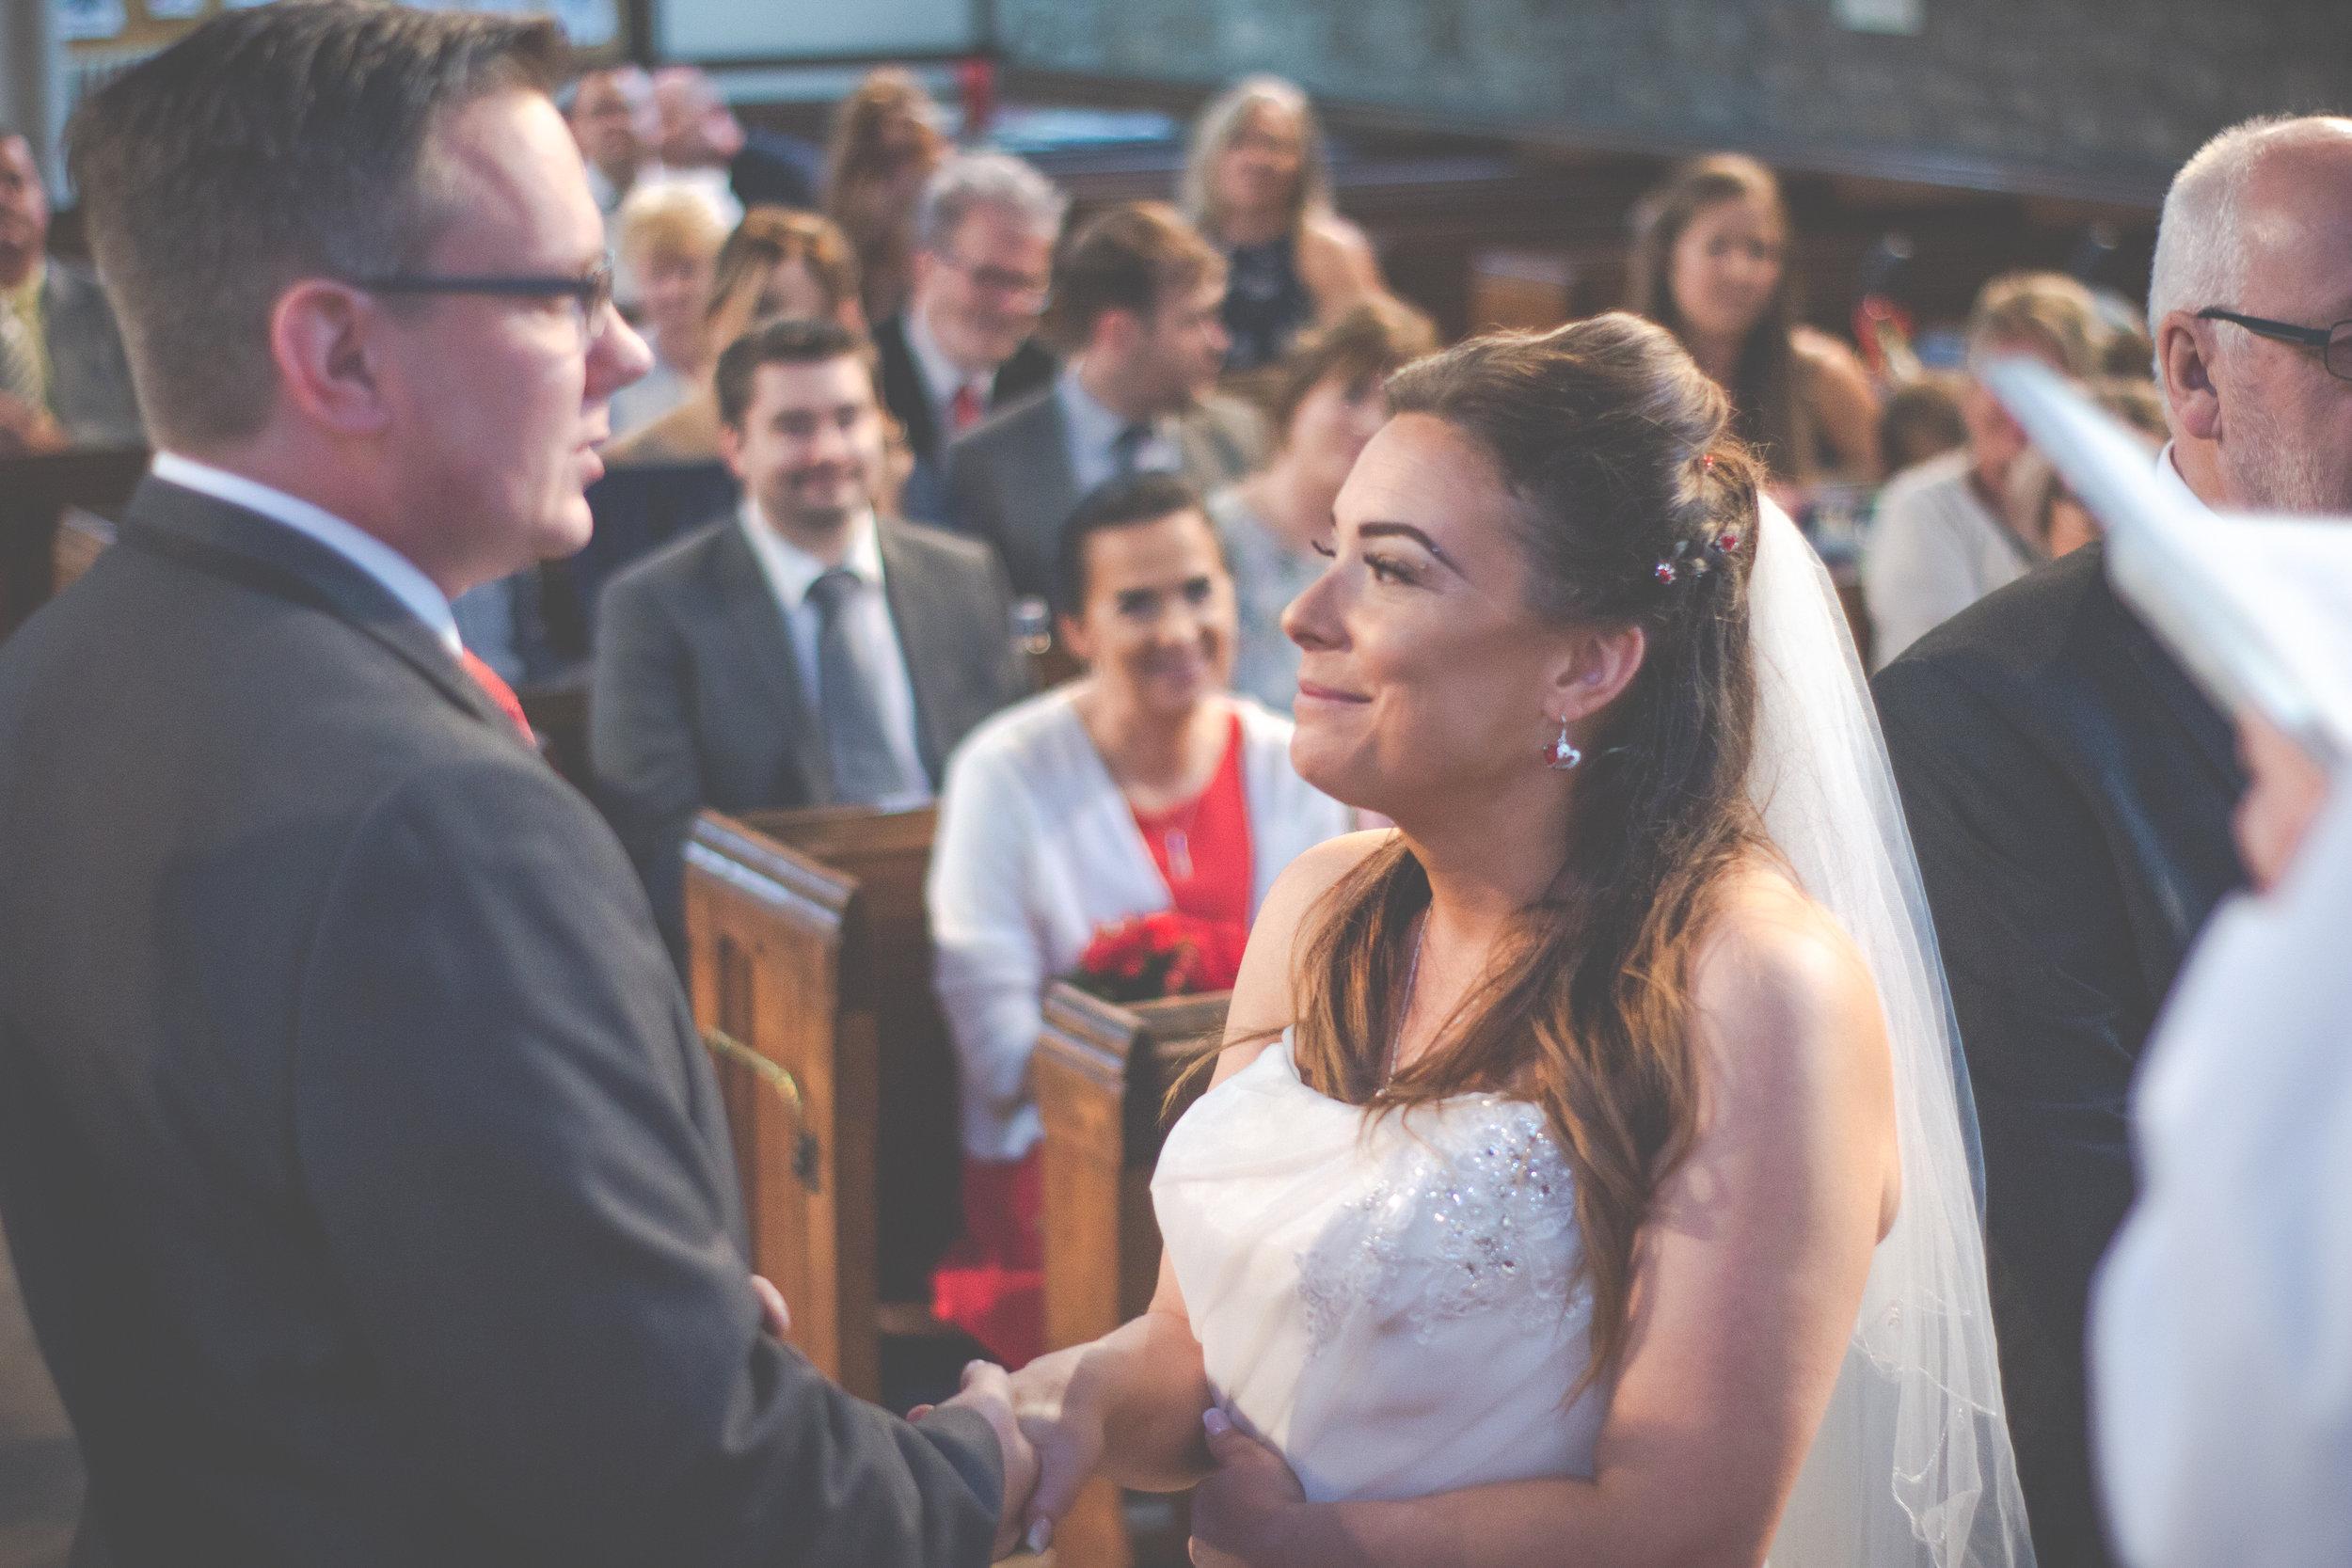 st-johns-ingrow-keighley-wedding-photos-13